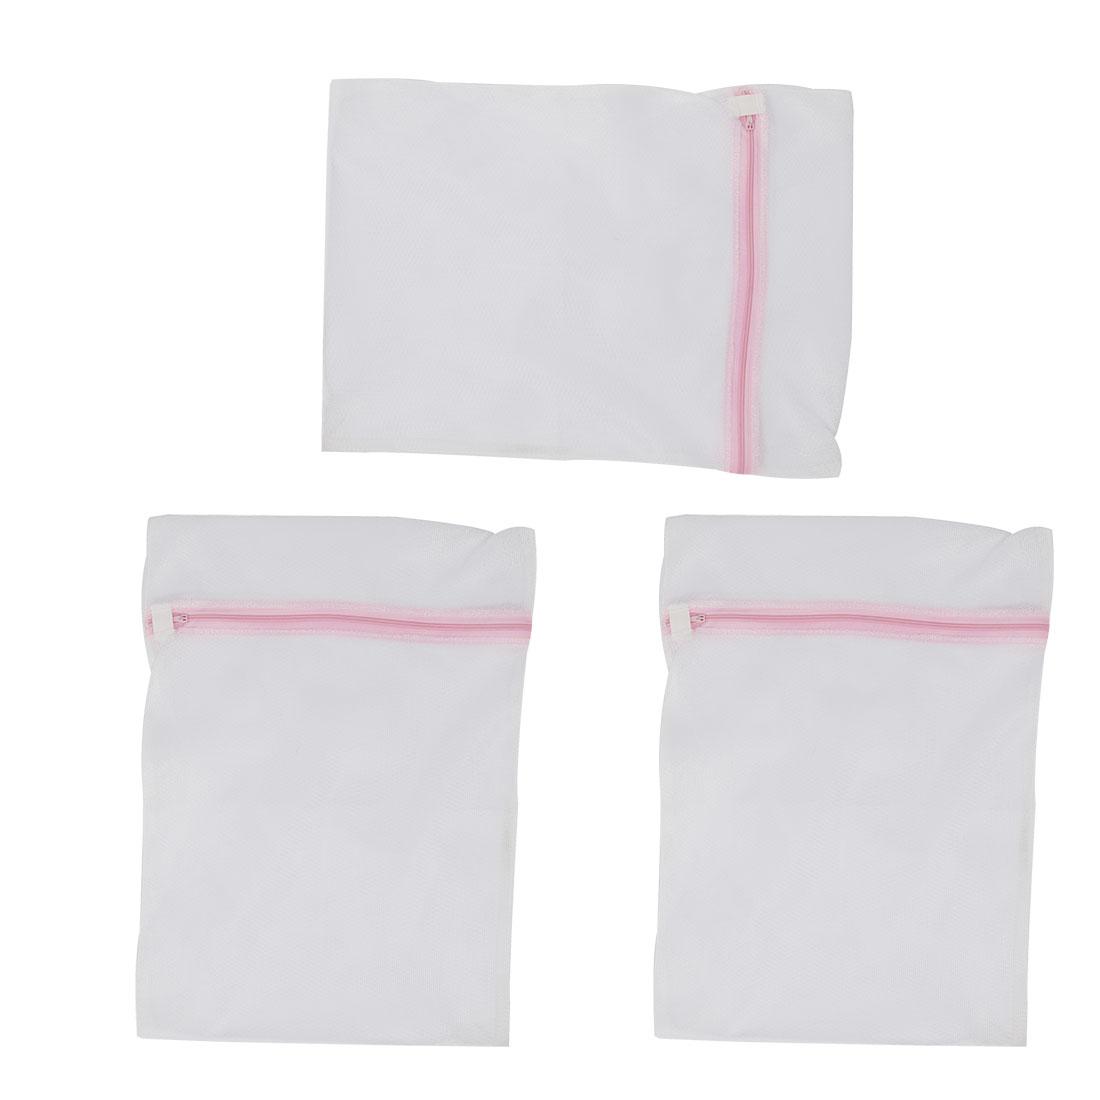 Home Laundry Washing Machine Clothes Socks Underwear Mesh Zippered Washing Bag 3pcs